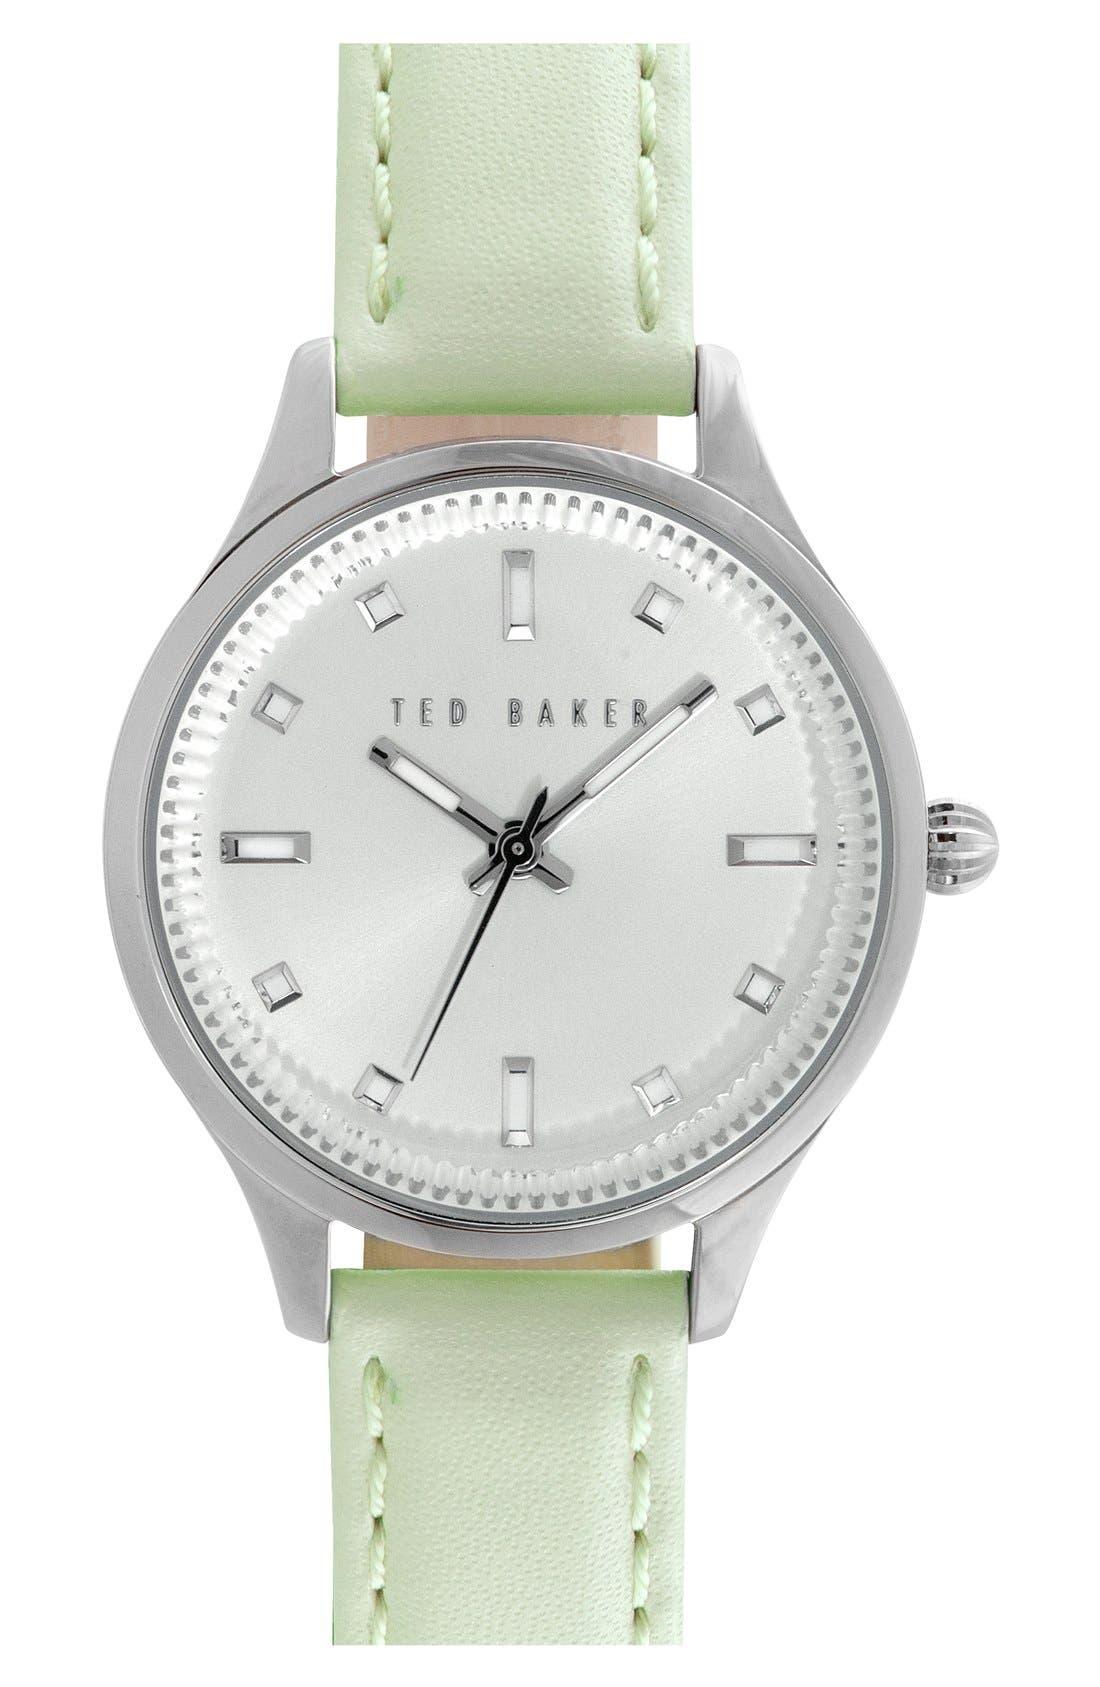 Ted Baker London 'Dress Sport' Leather Strap Watch, 32mm